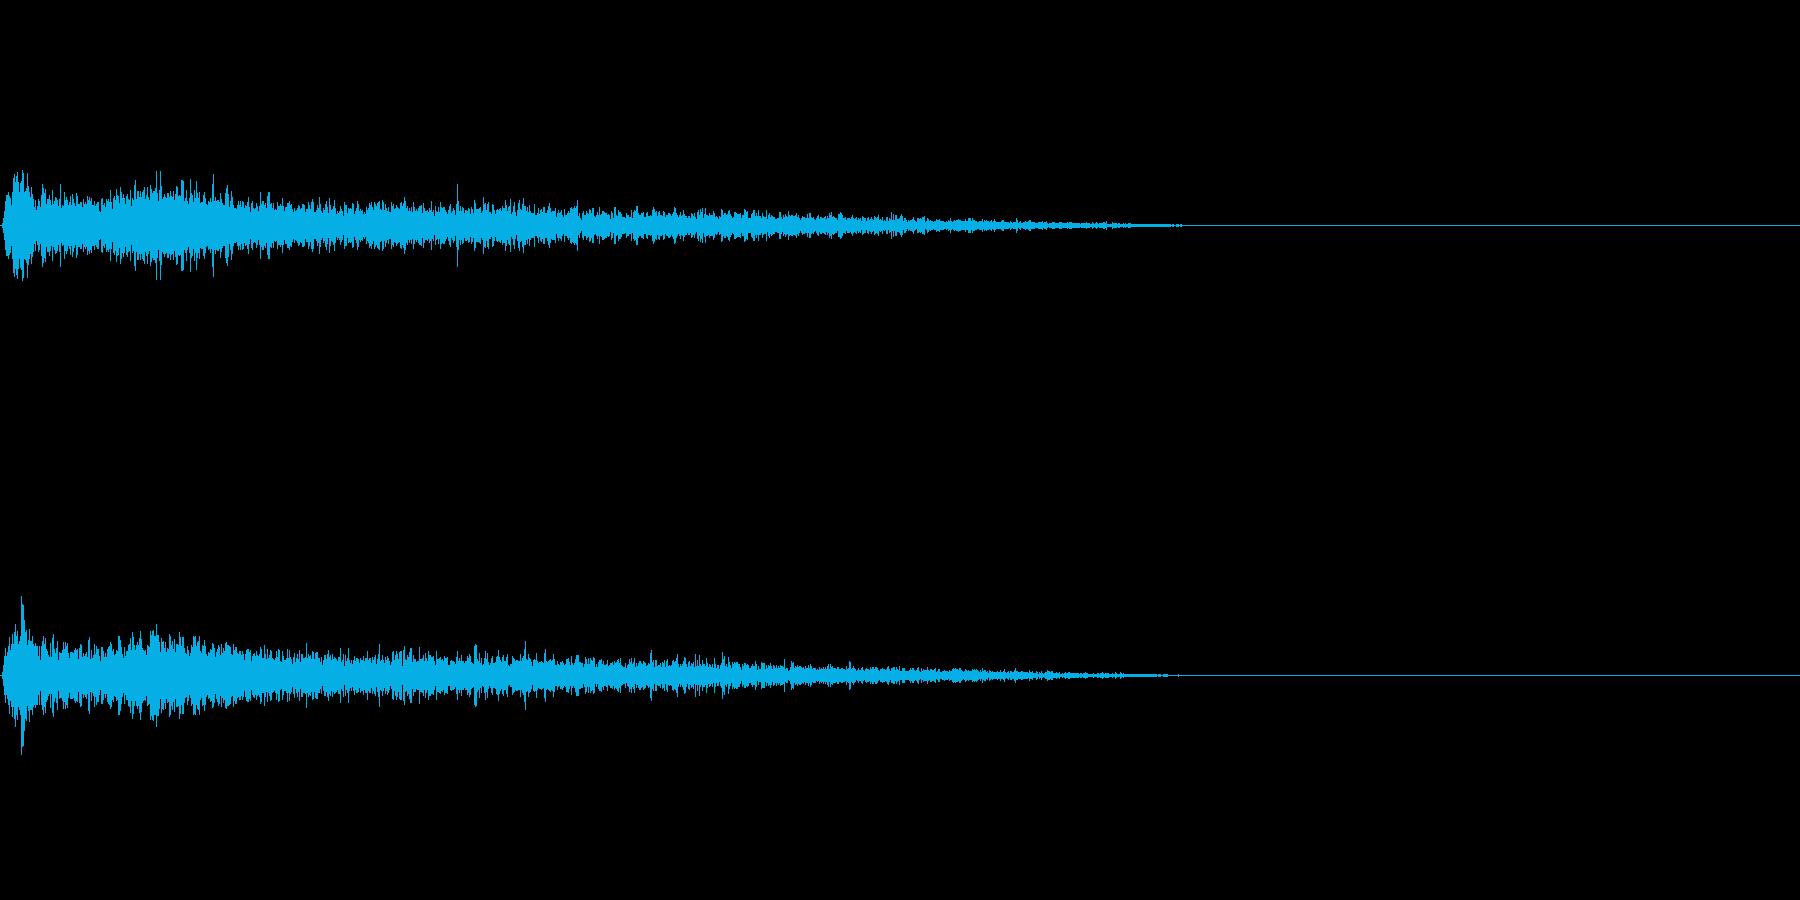 Aメジャー インパクト音 衝撃音の再生済みの波形